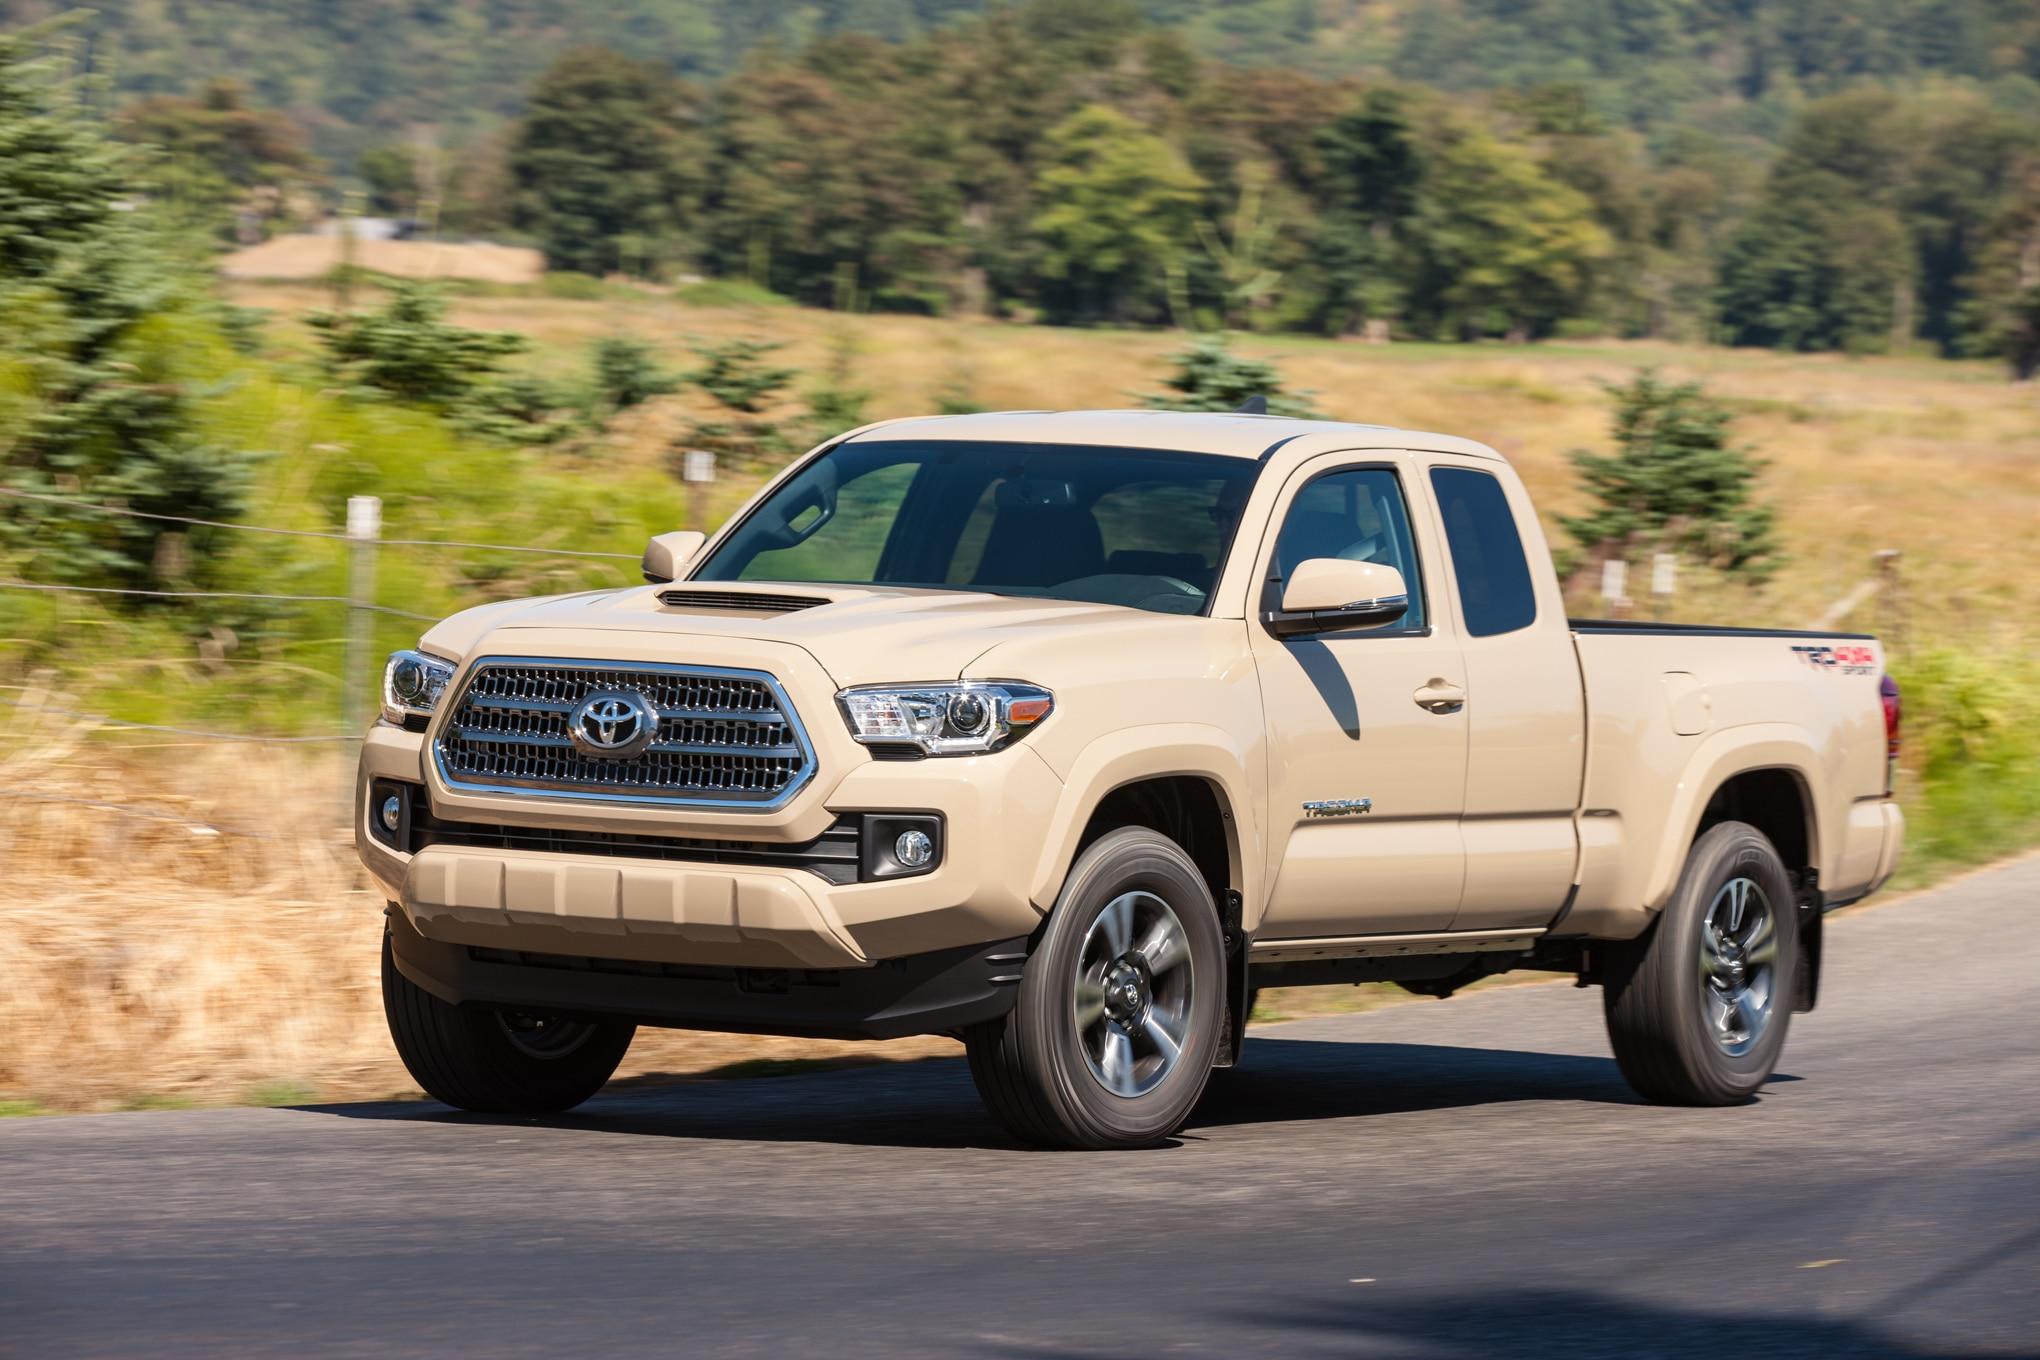 Worksheet. 2016 Toyota Tacoma Priced Starting at 24200